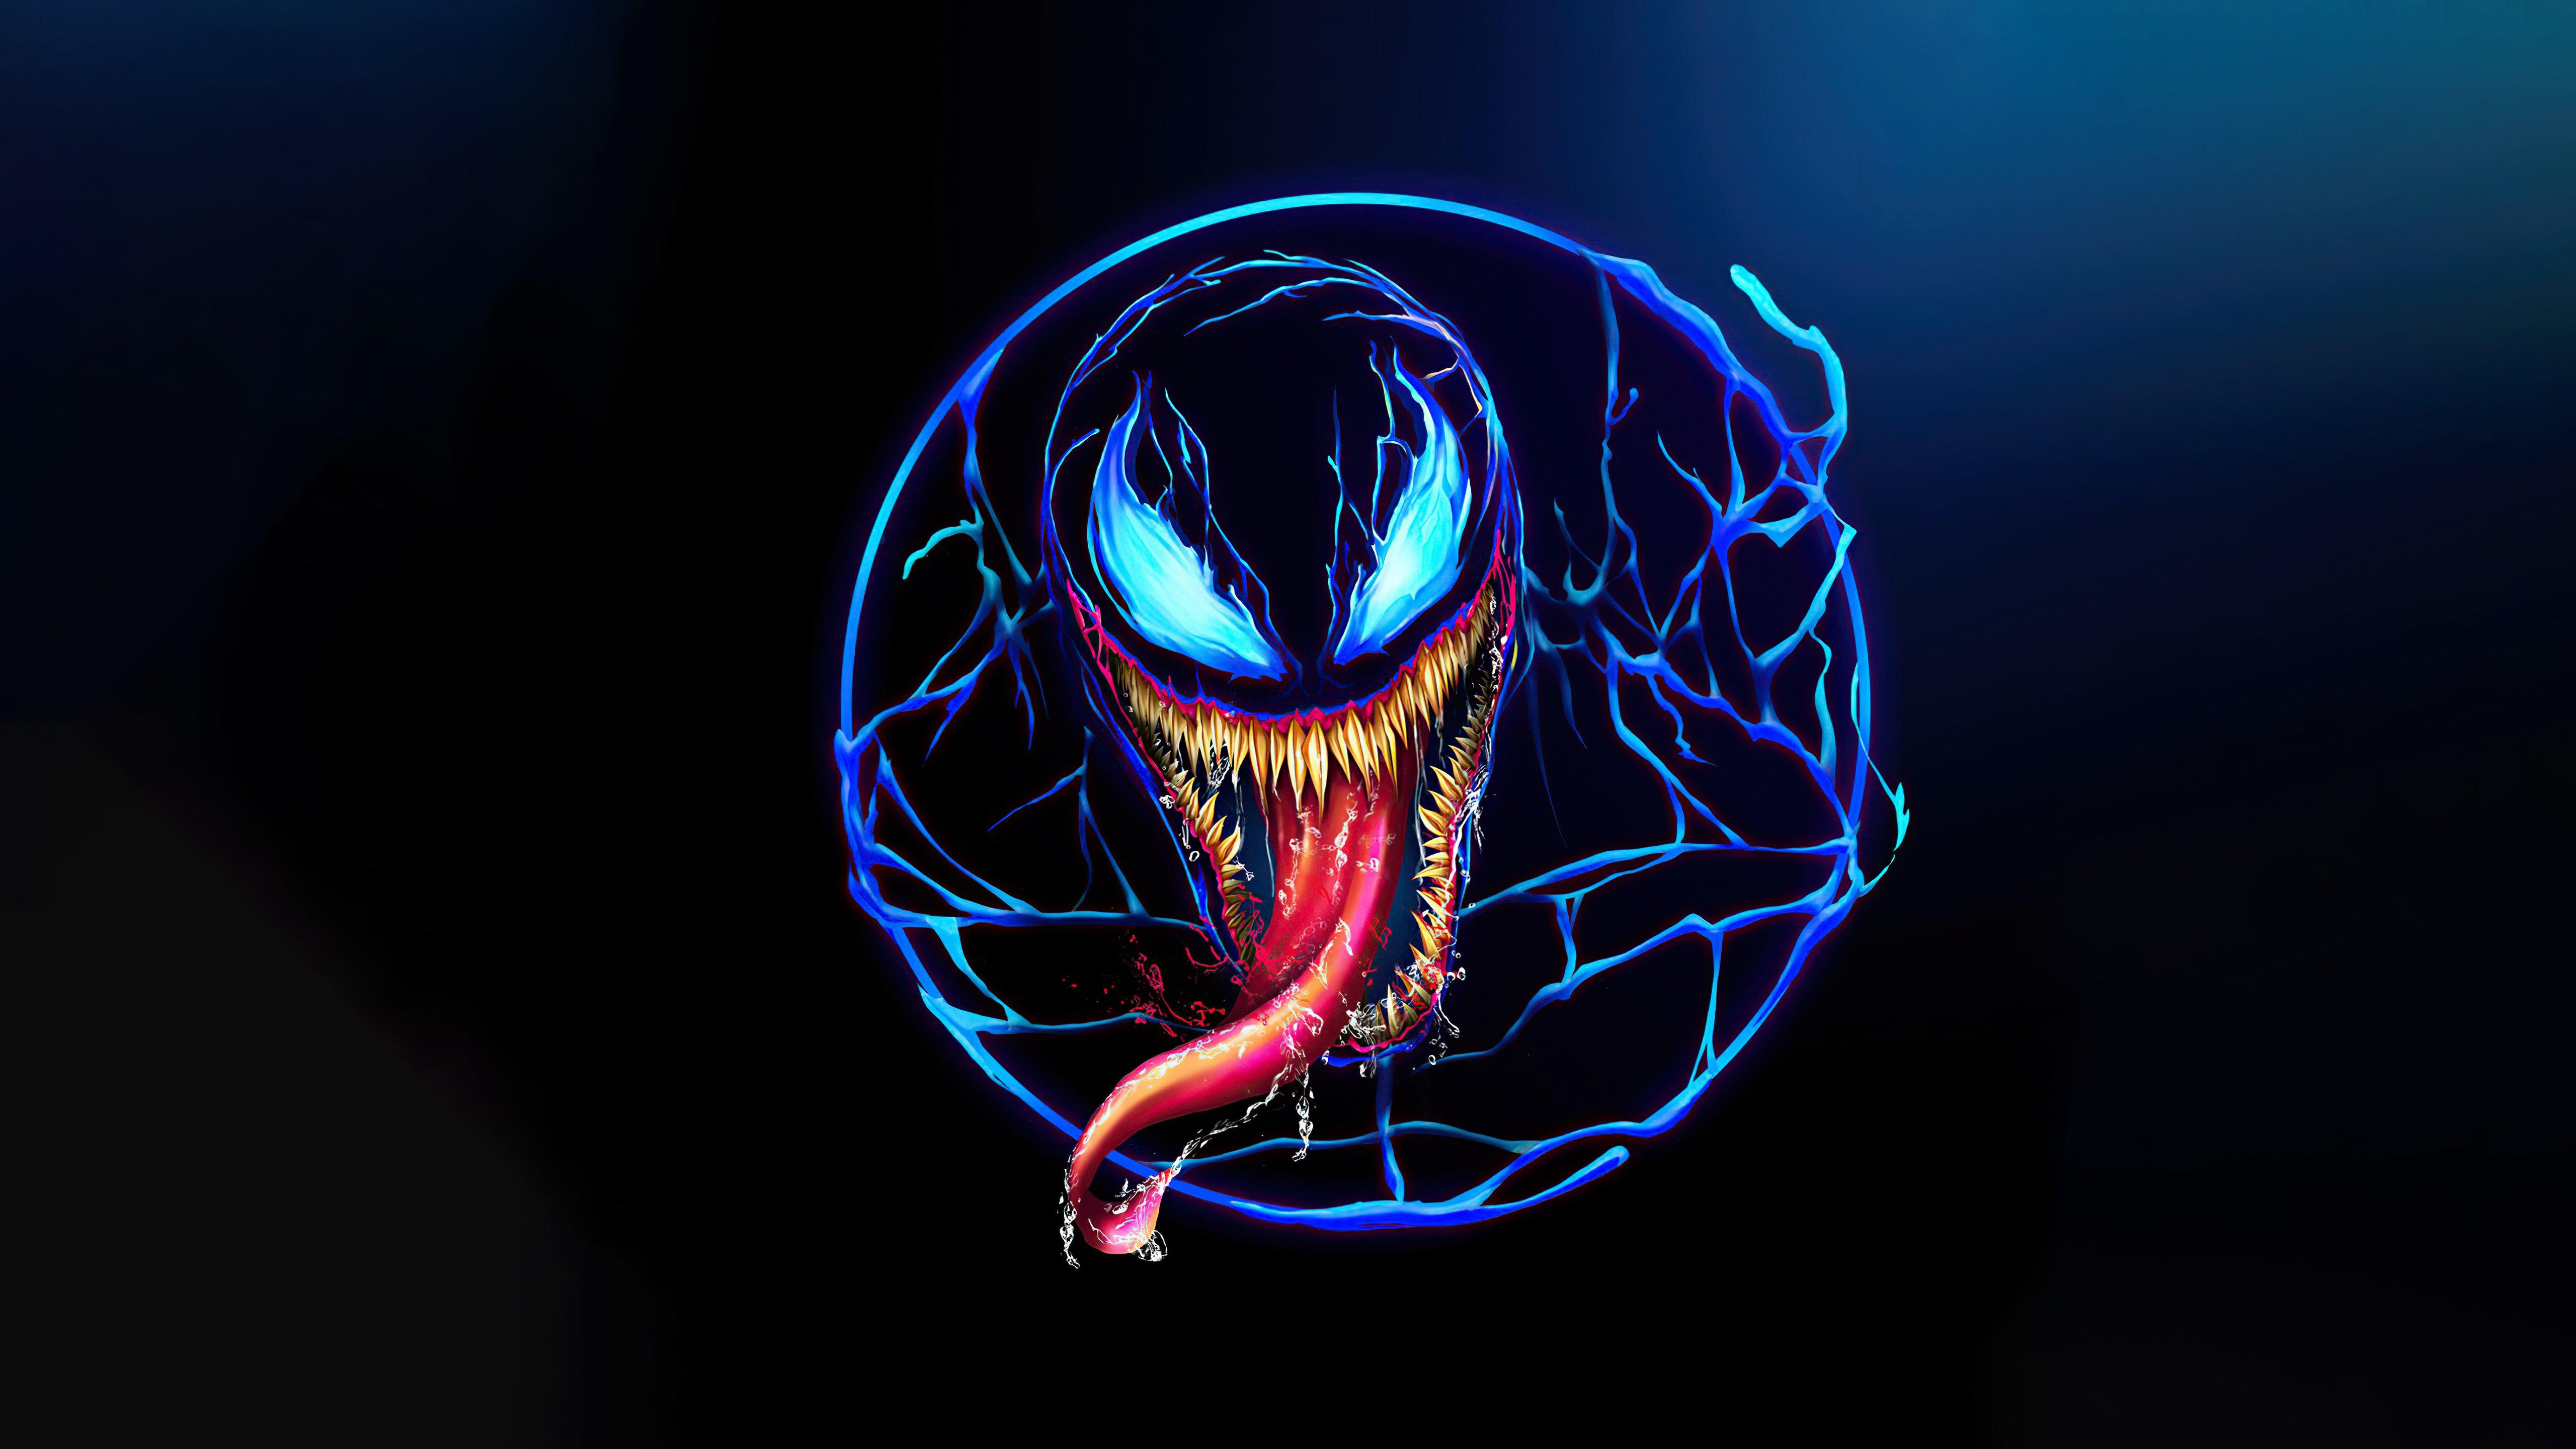 Wallpaper Venom Neon Design